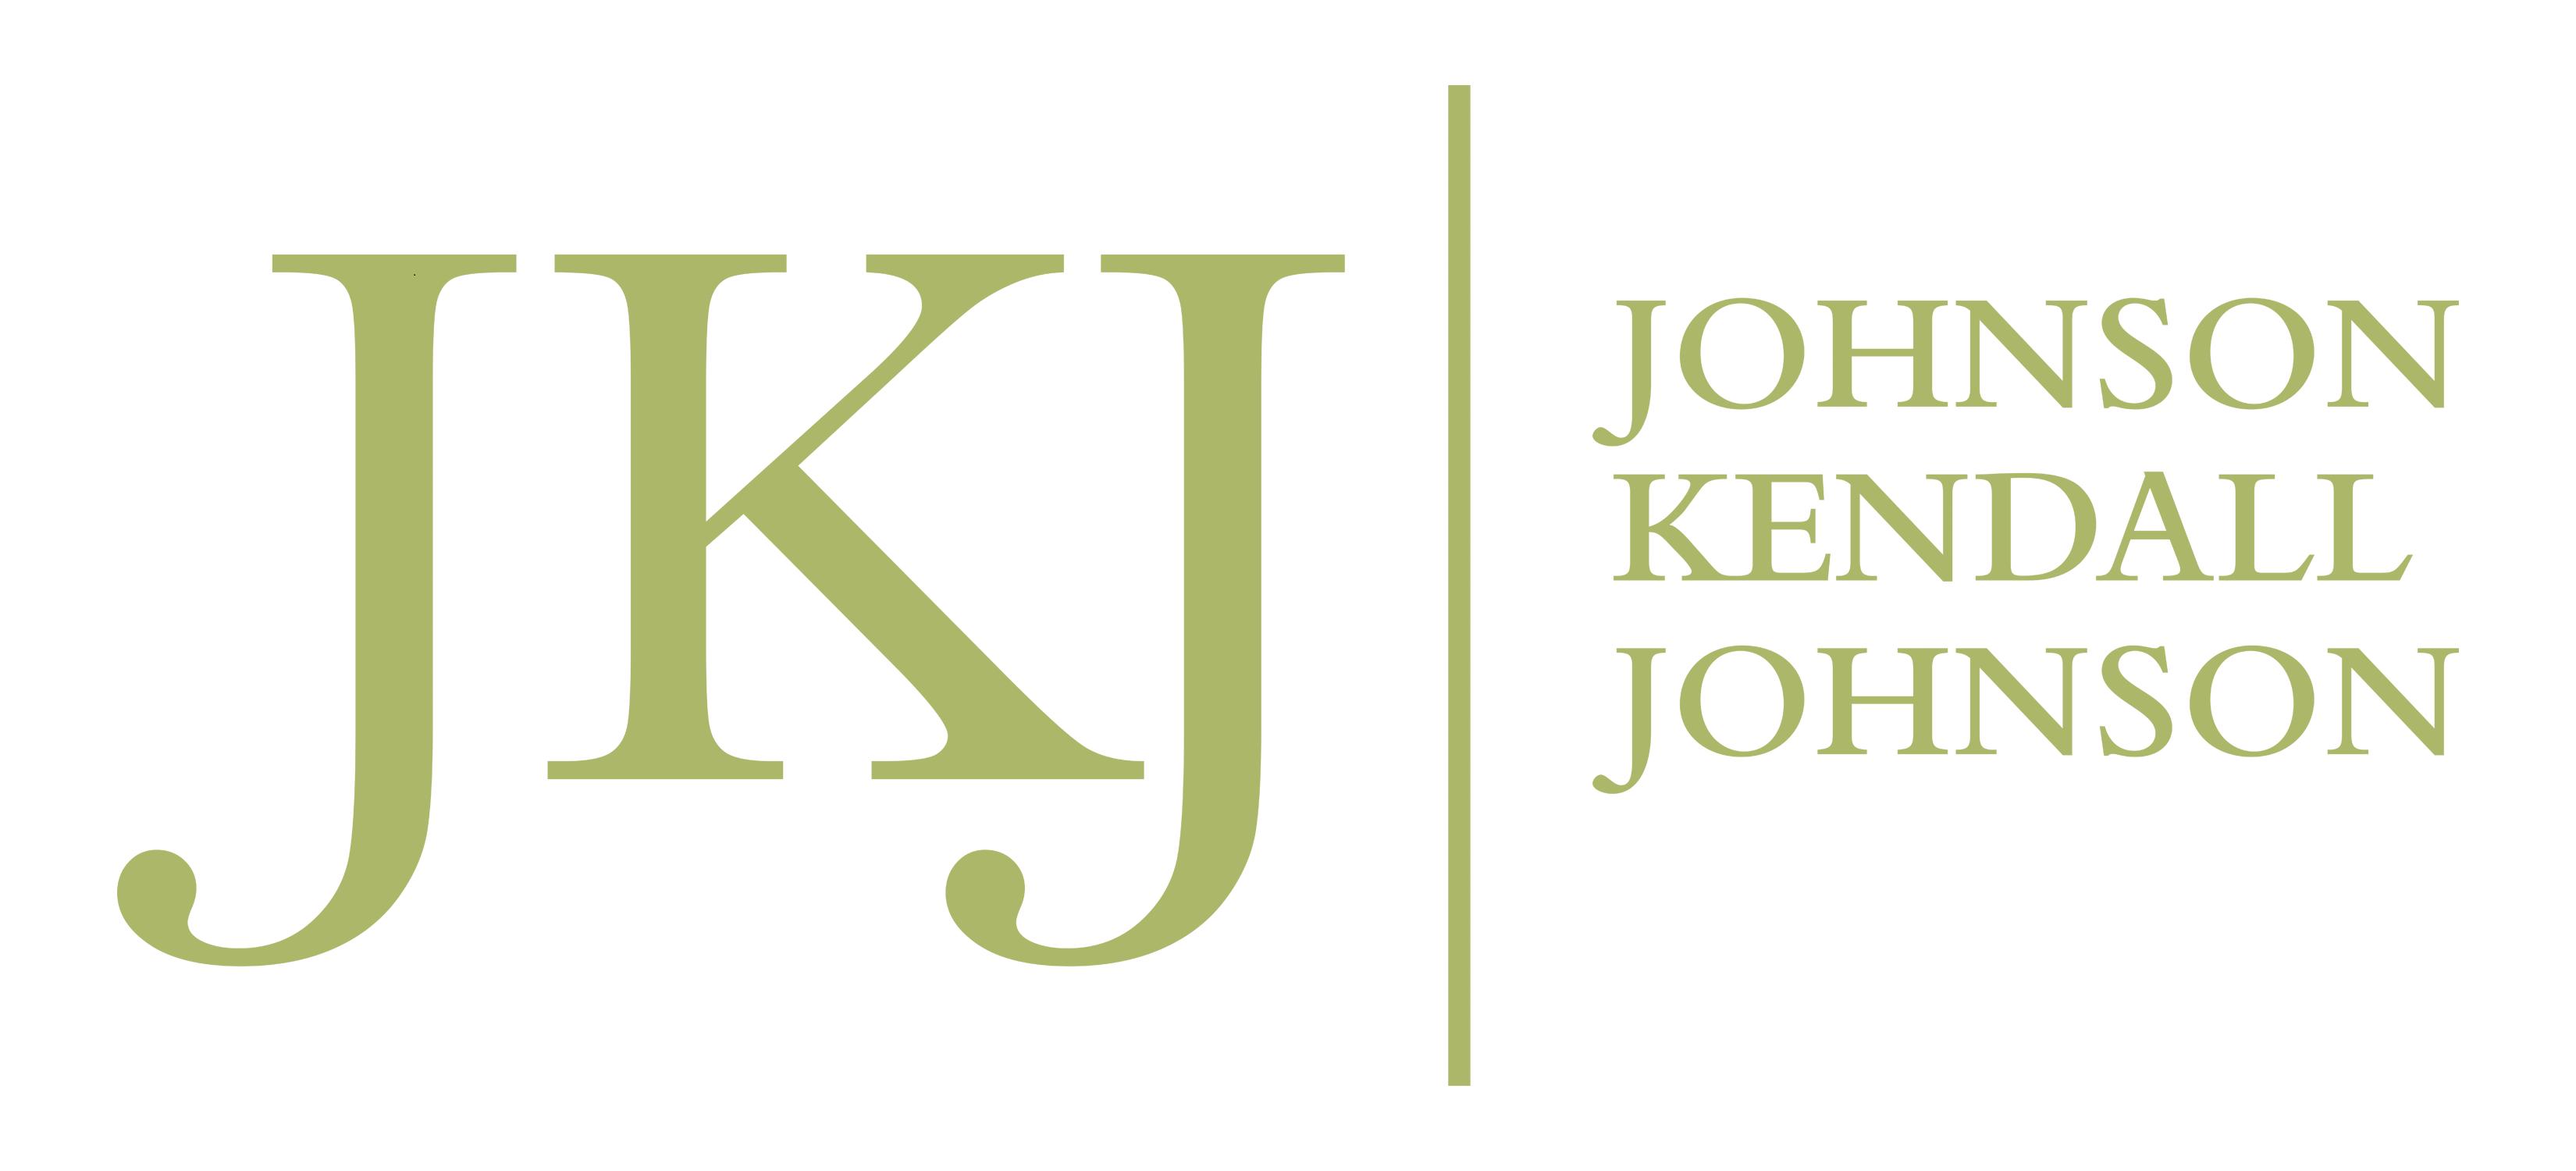 Johnson Kendall Johnson